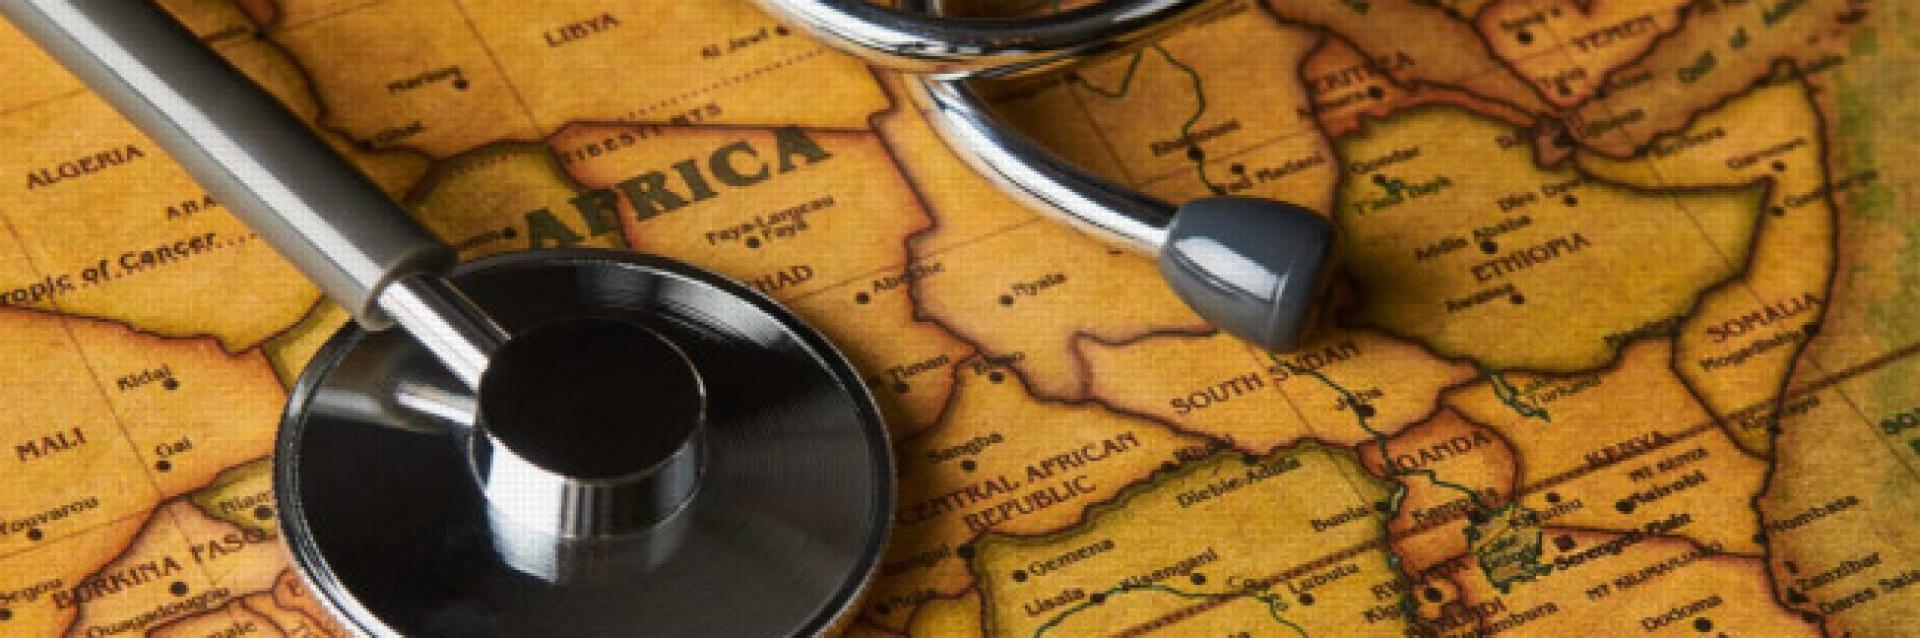 Africa Business: Health Forum 2019